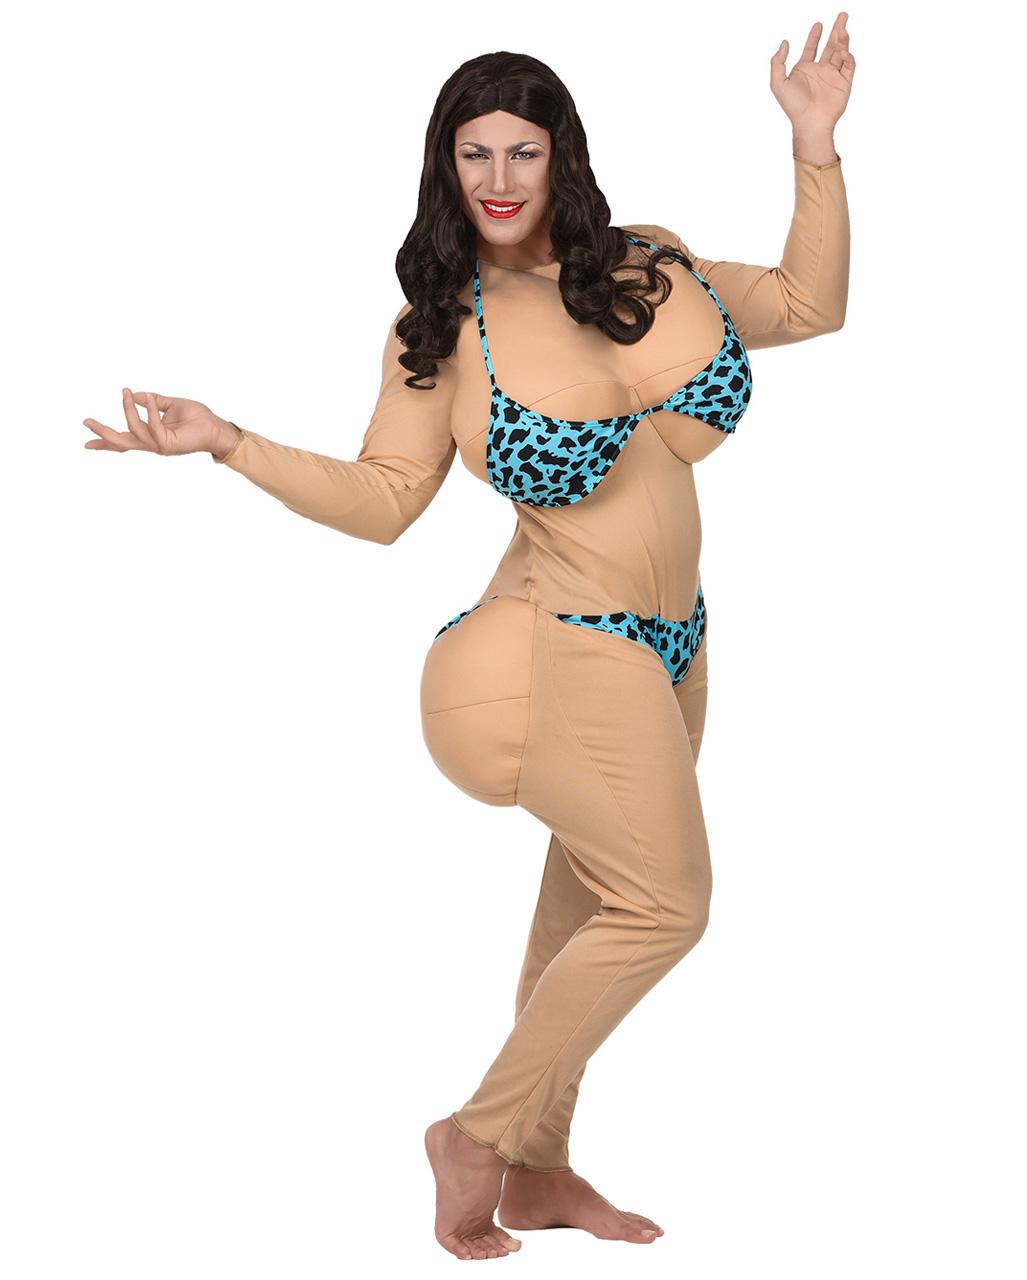 ... Miss Bikini Drag Queen Costume